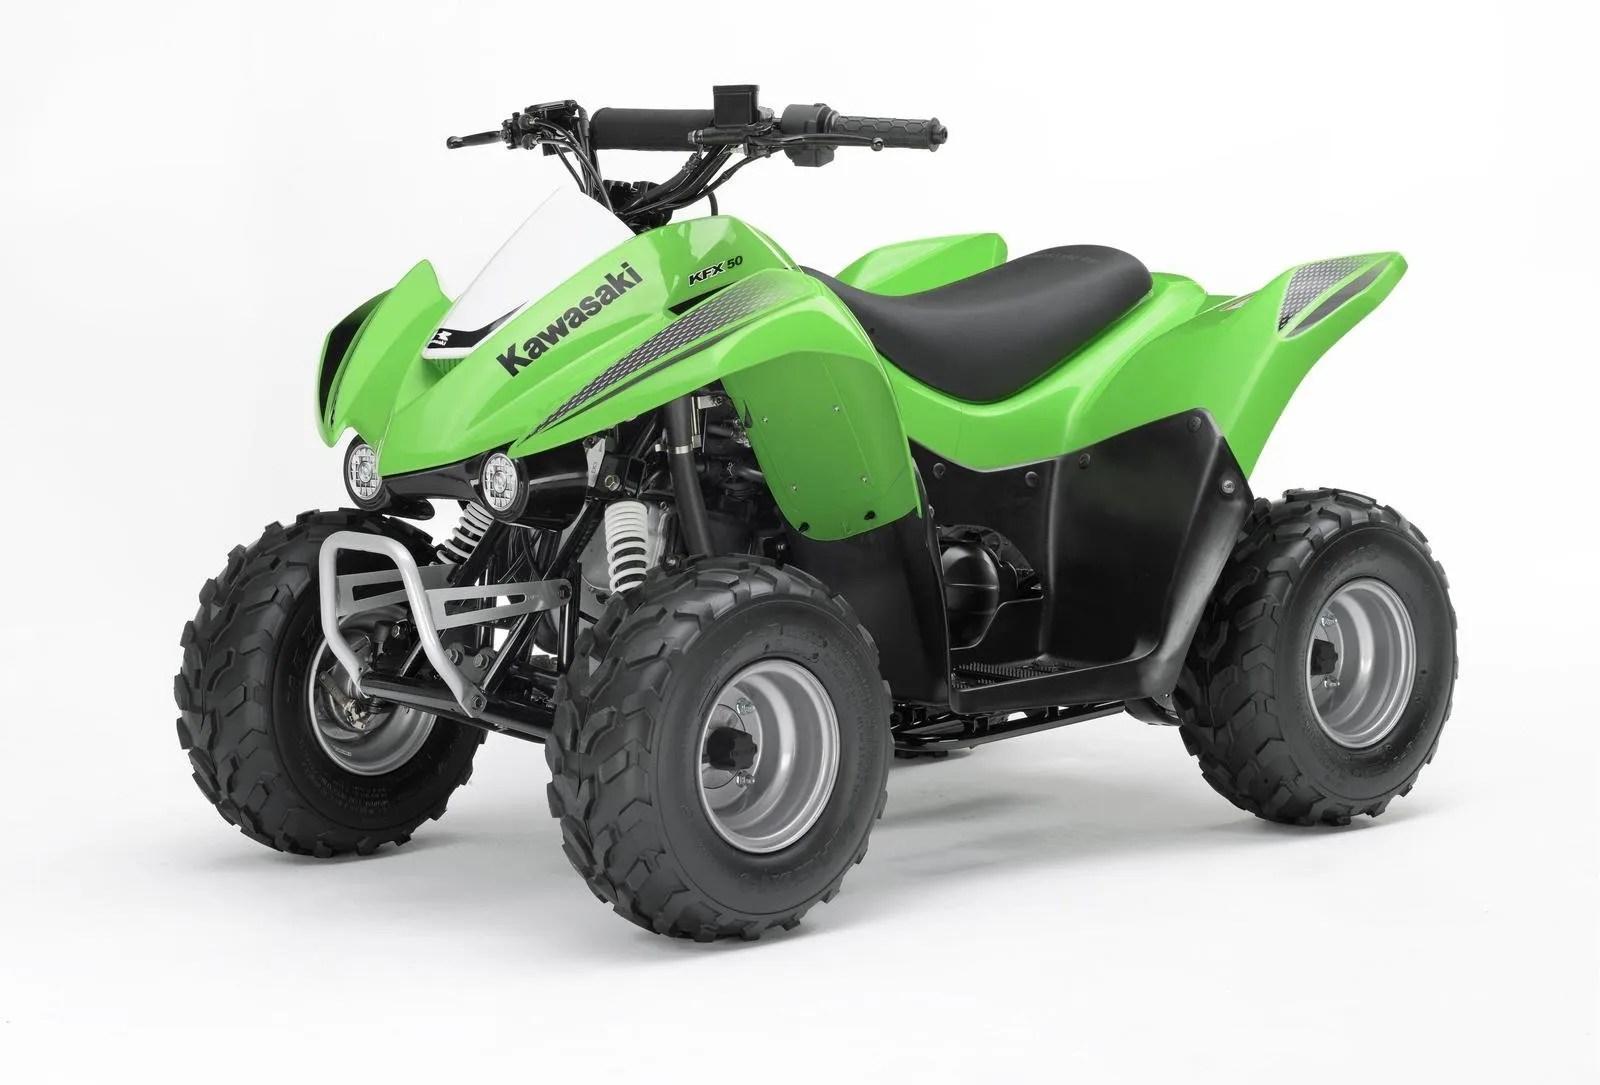 Kawasaki Kfx50 Review